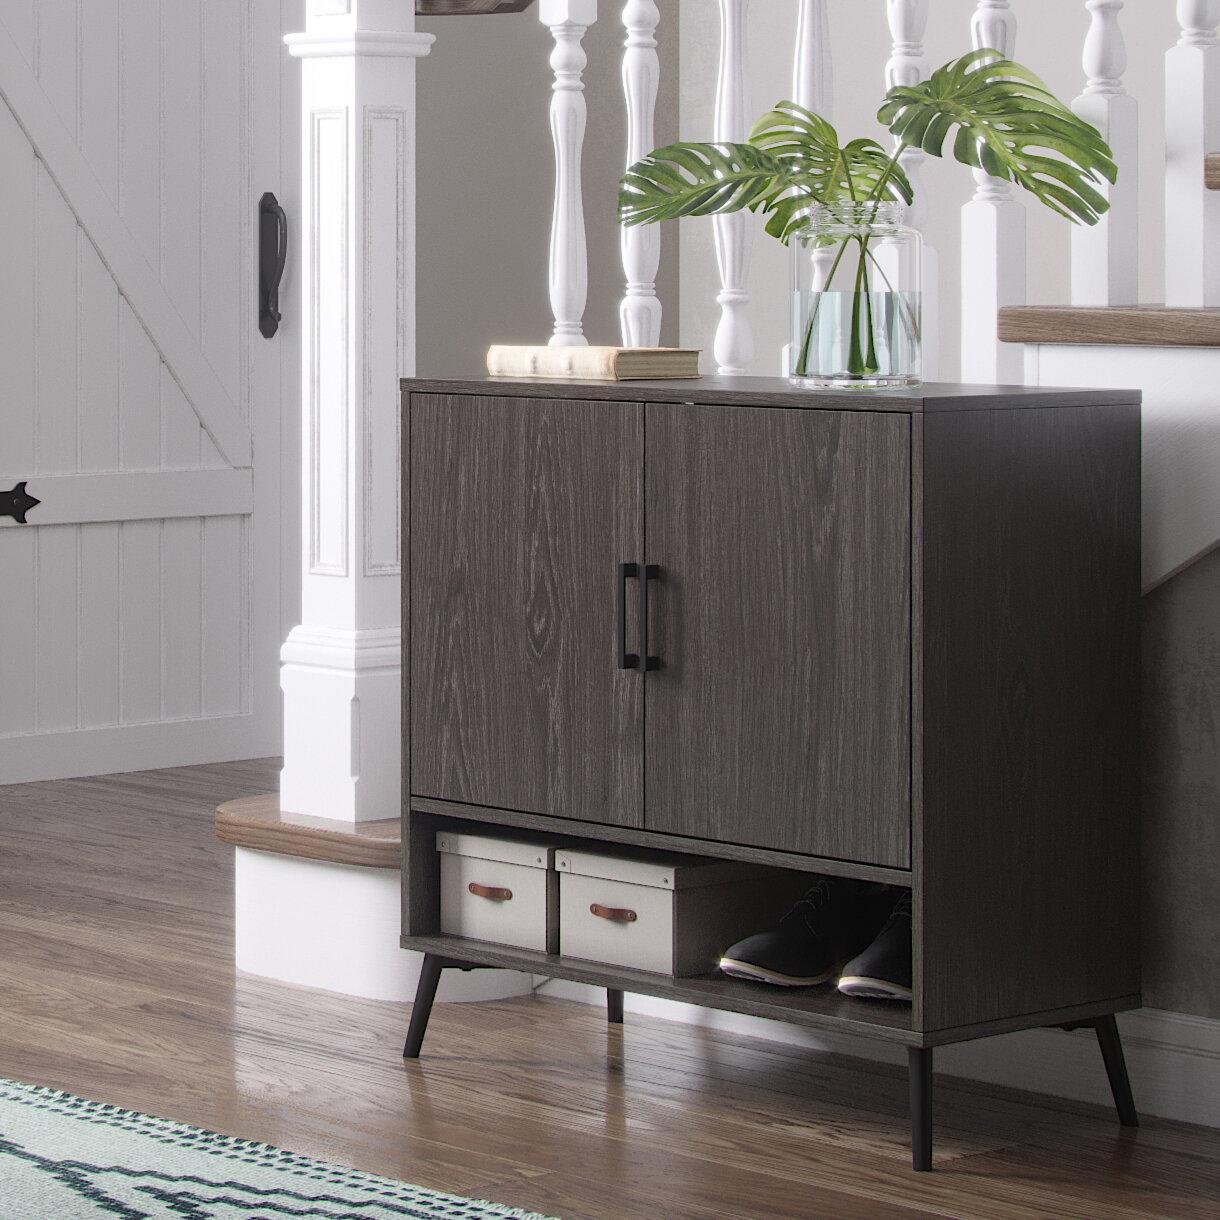 Ebern Designs Wysocki 12 Pair Shoe Storage Cabinet Reviews Wayfair Co Uk